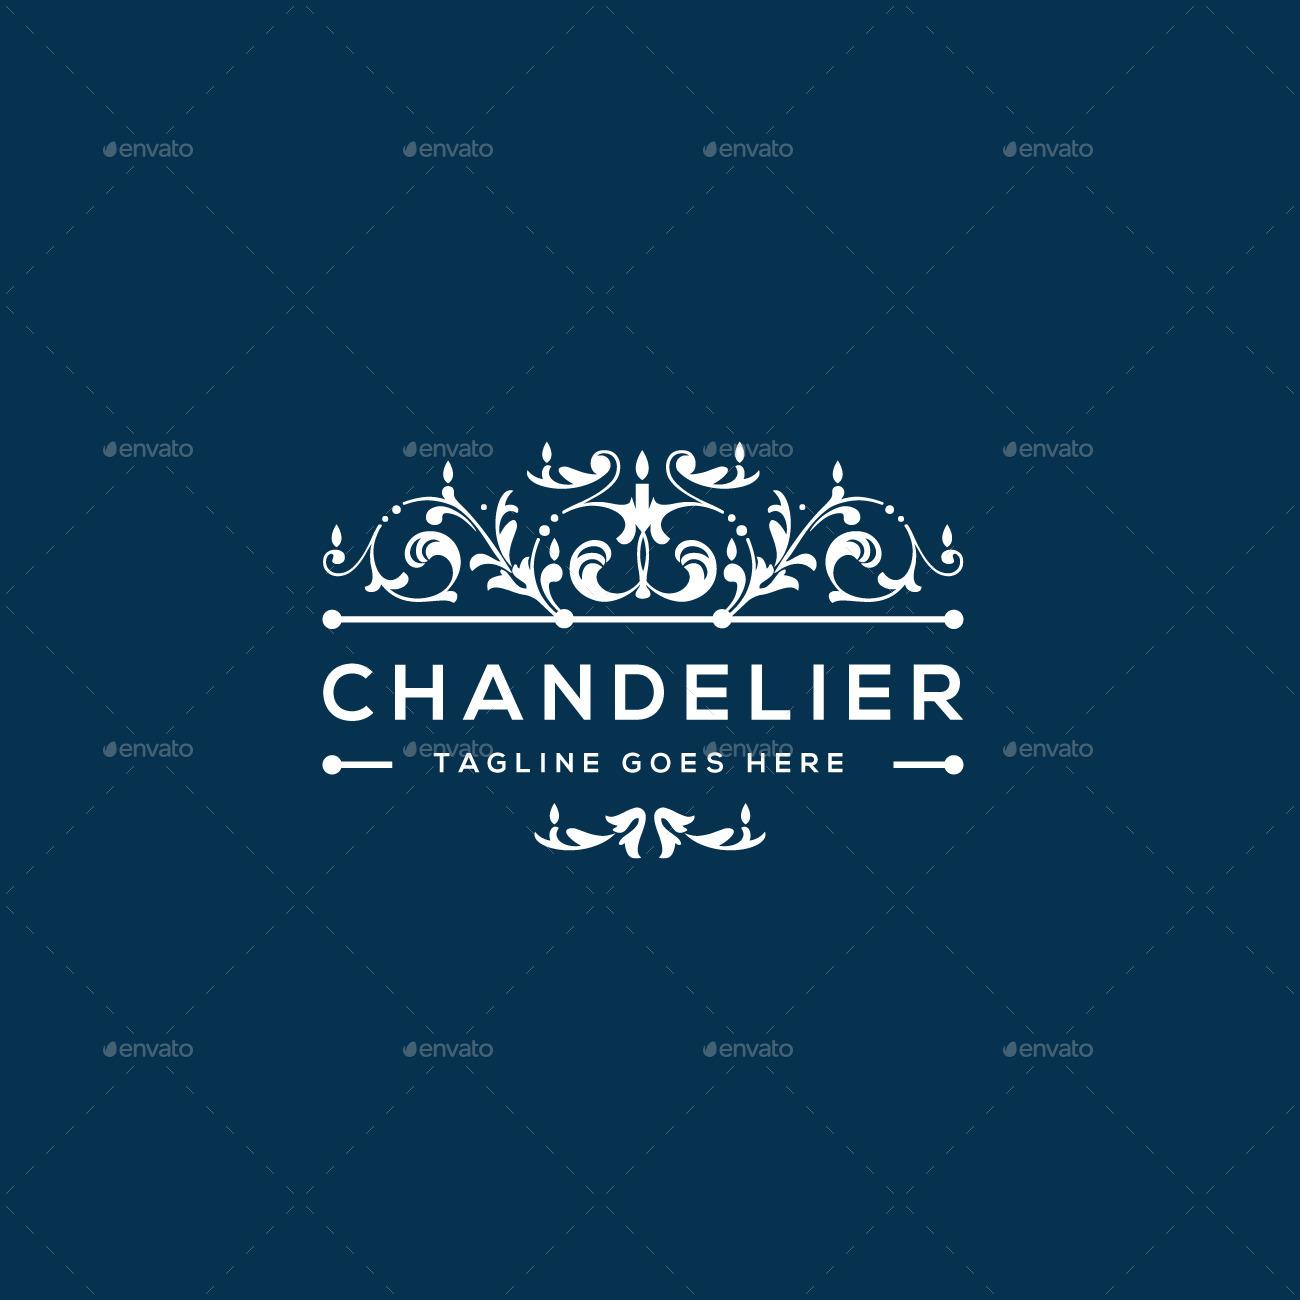 Chandelier Logo Template by designgarrad – Chandelier Logo